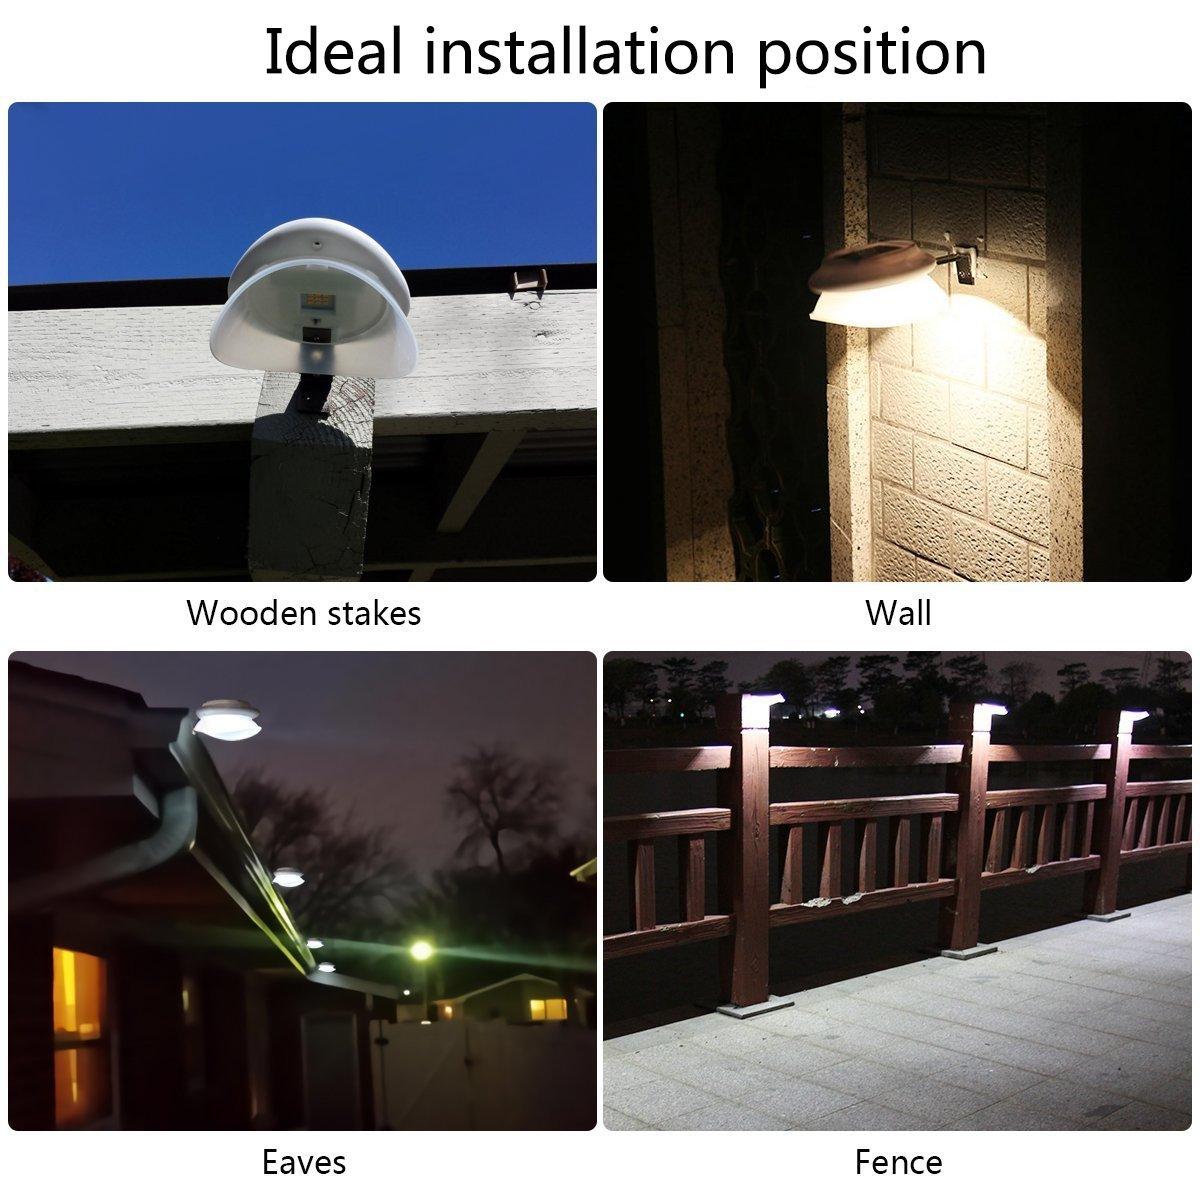 Solar Fence Lights, DS Lighting Outdoor 9 LED Gutter Light Waterproof Security Lamps for Eaves Garden Landscape Walkway (Warm White, 6 Pack)